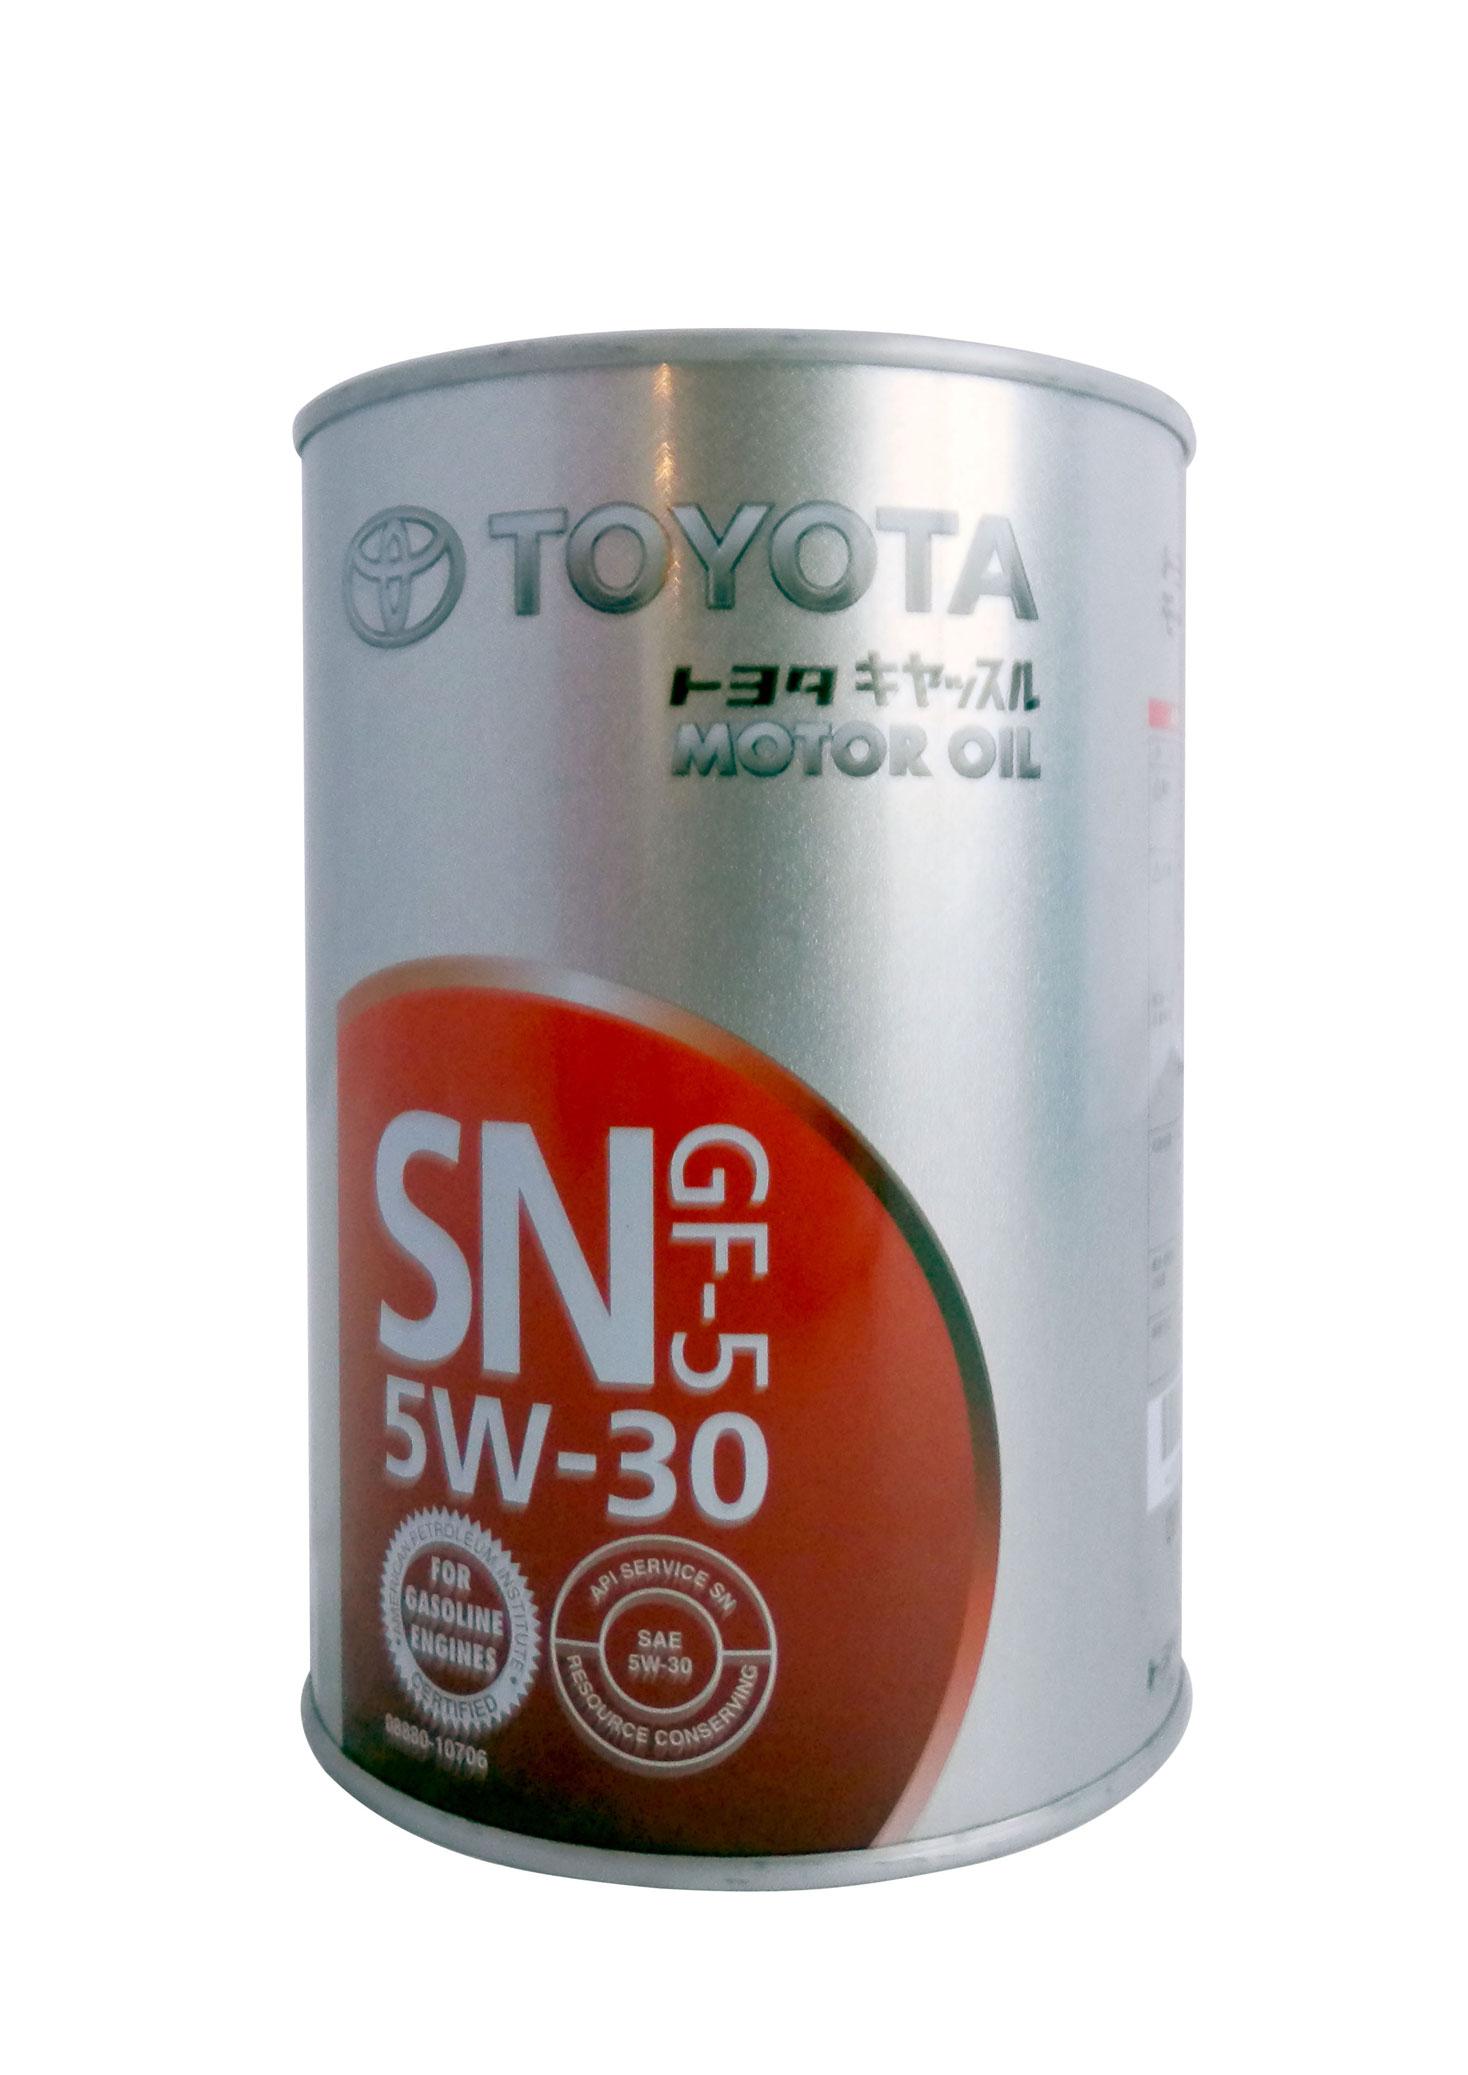 toyota motor oil 5w-30 мин. sn/cf характеристики